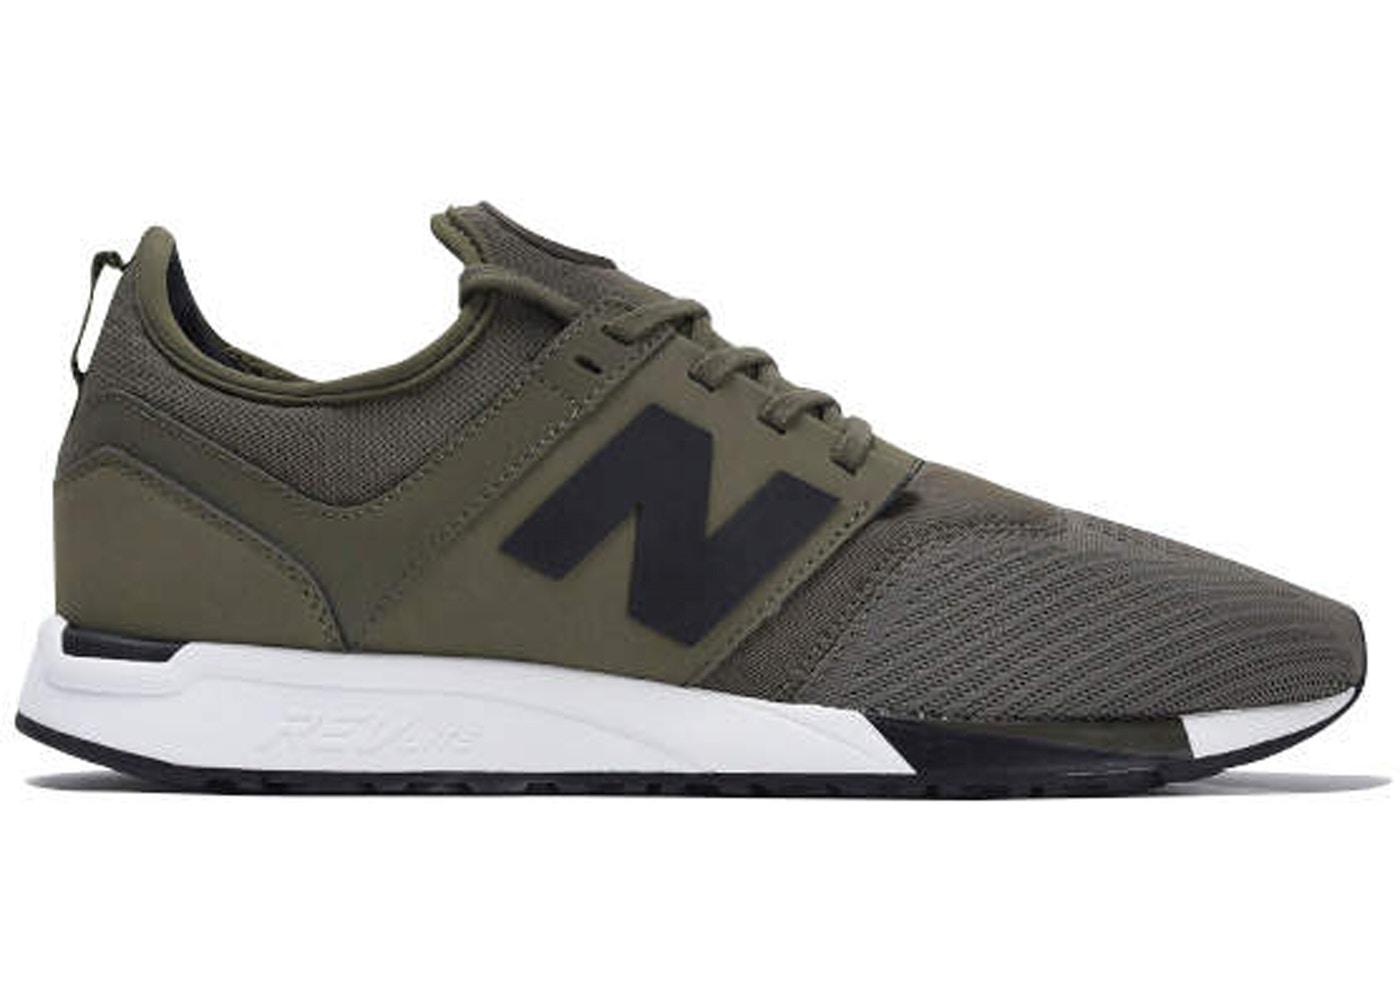 New Balance 247 Sport Olive - MRL247OL